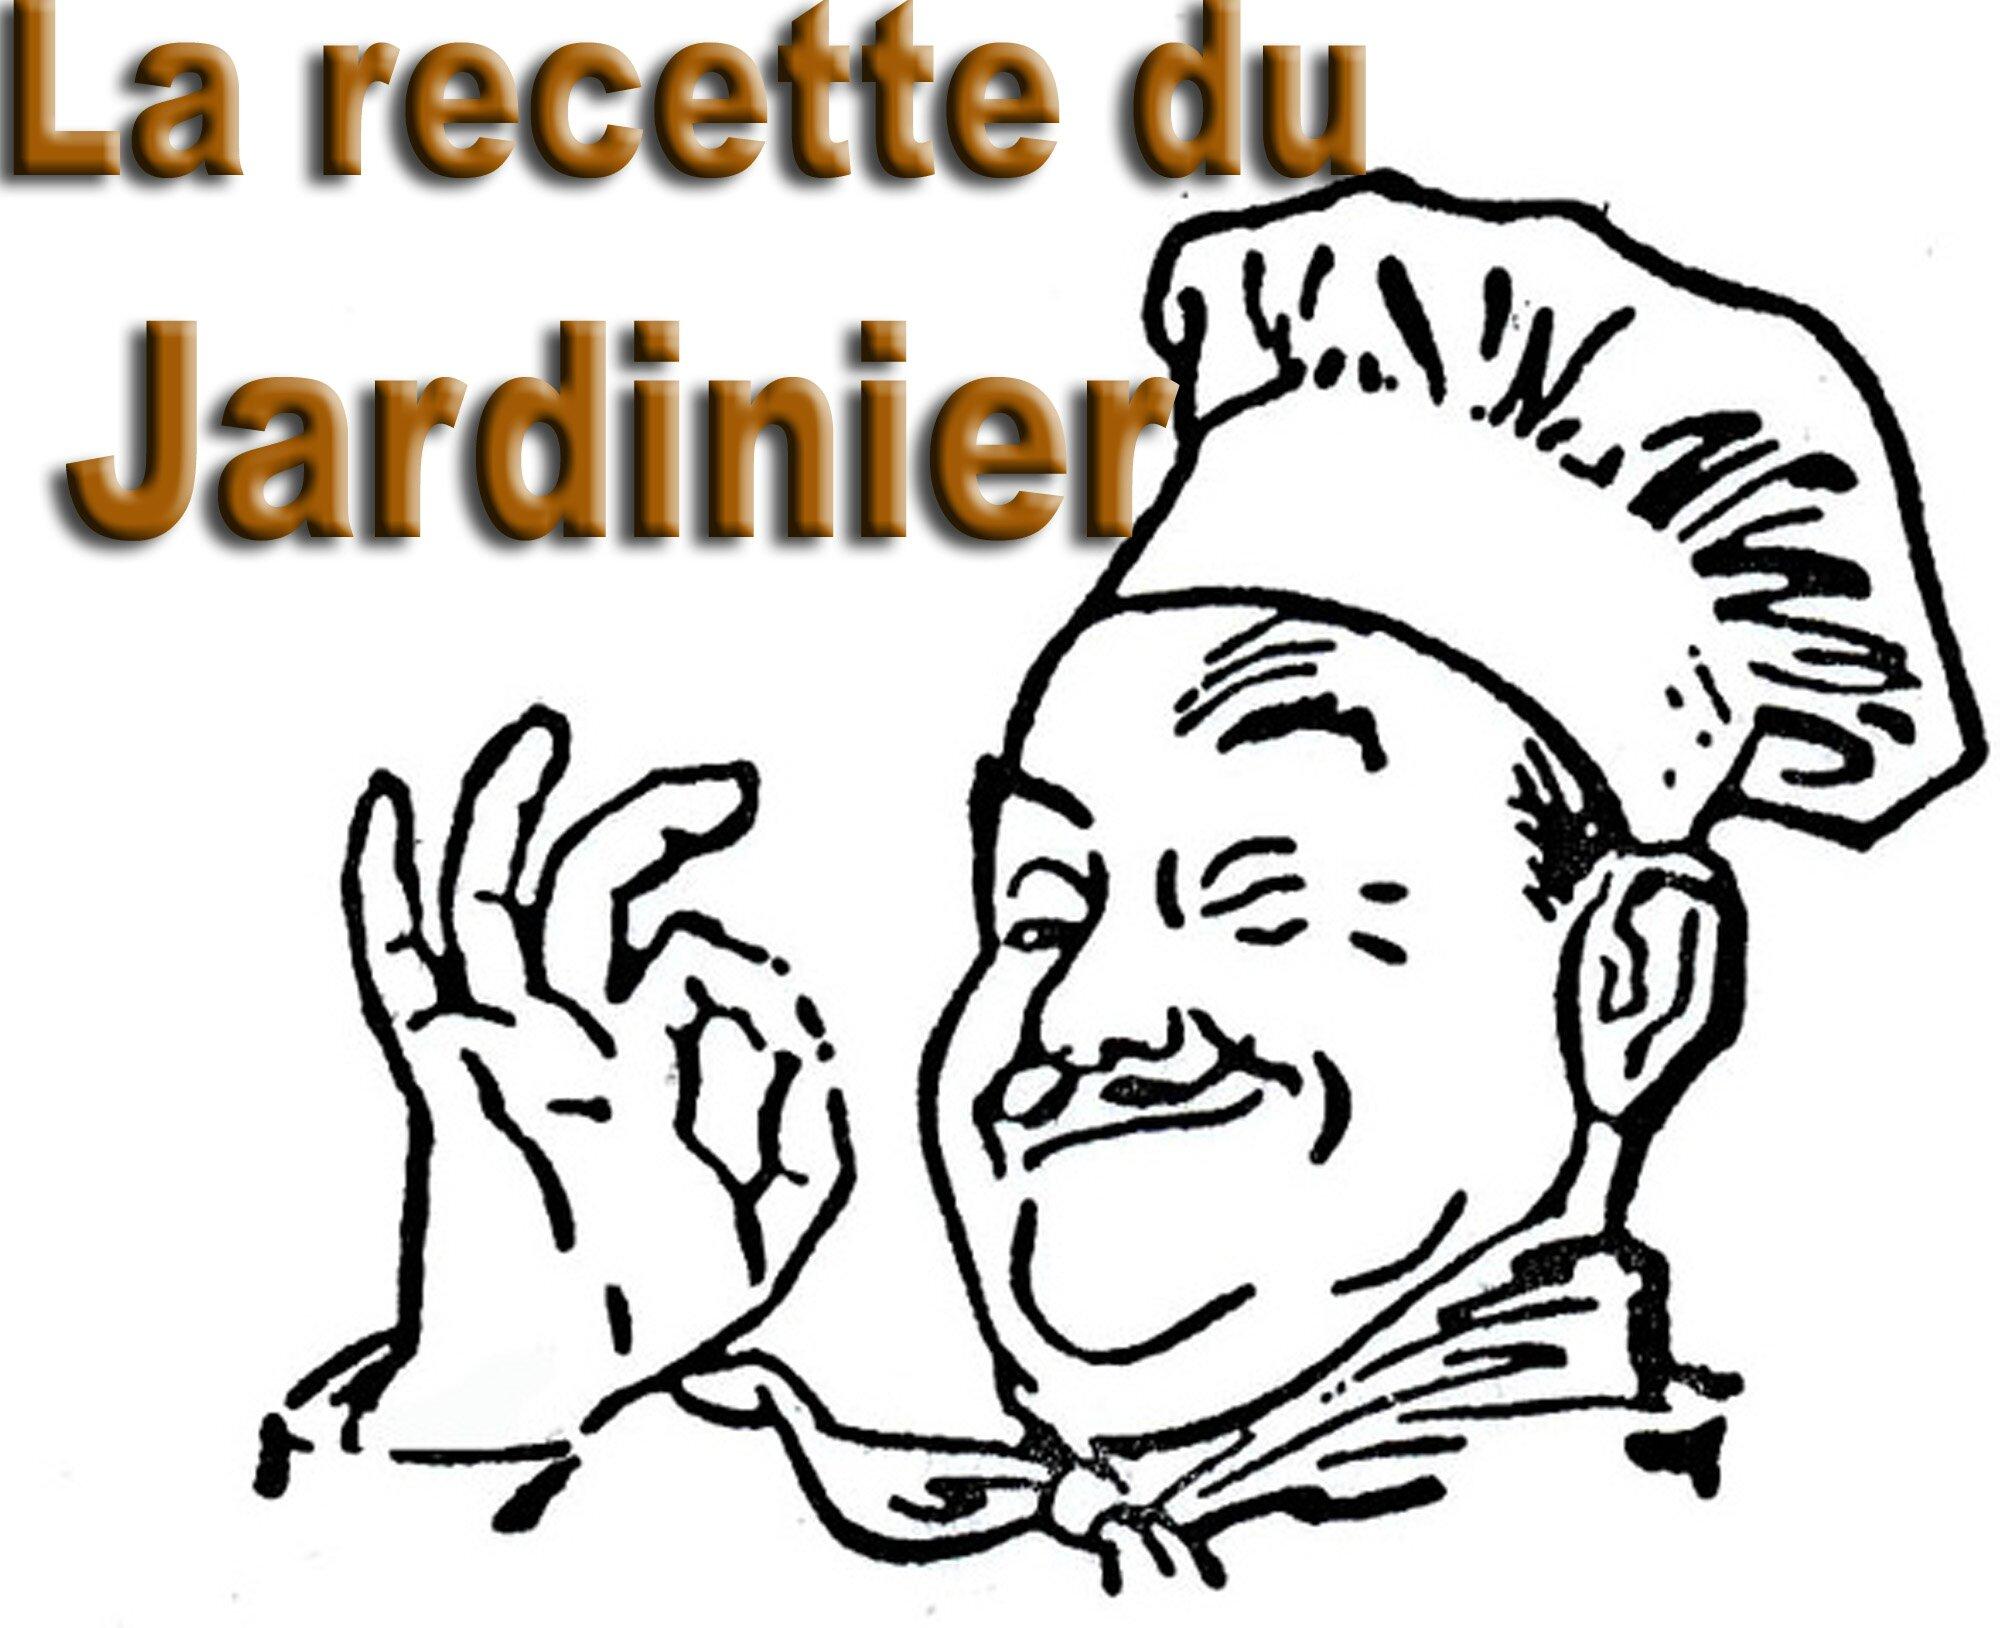 LA RECETTE DU JARDINIER